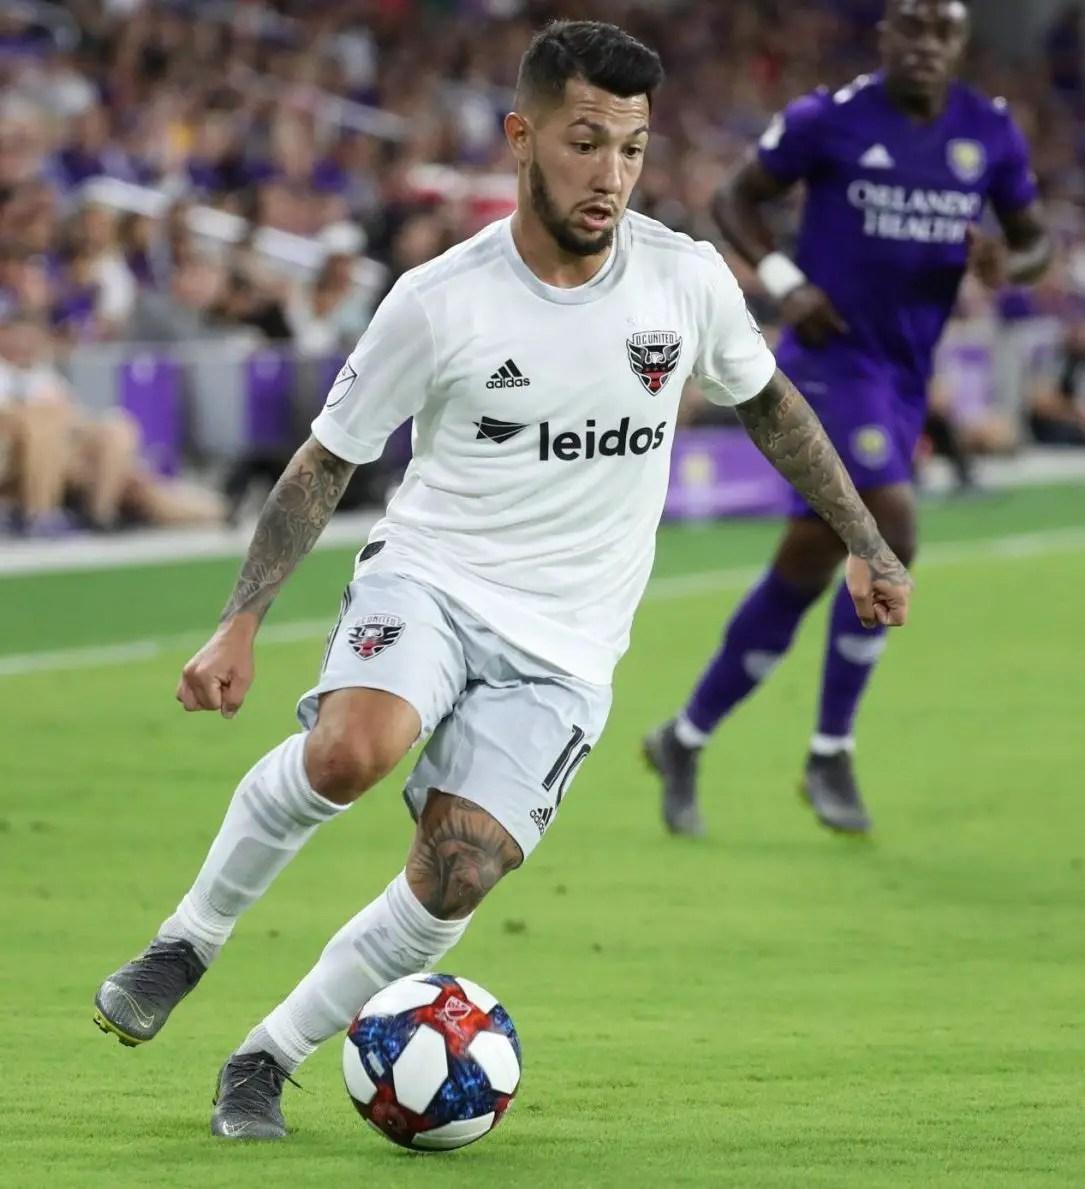 United Keeping Tabs On MLS Star